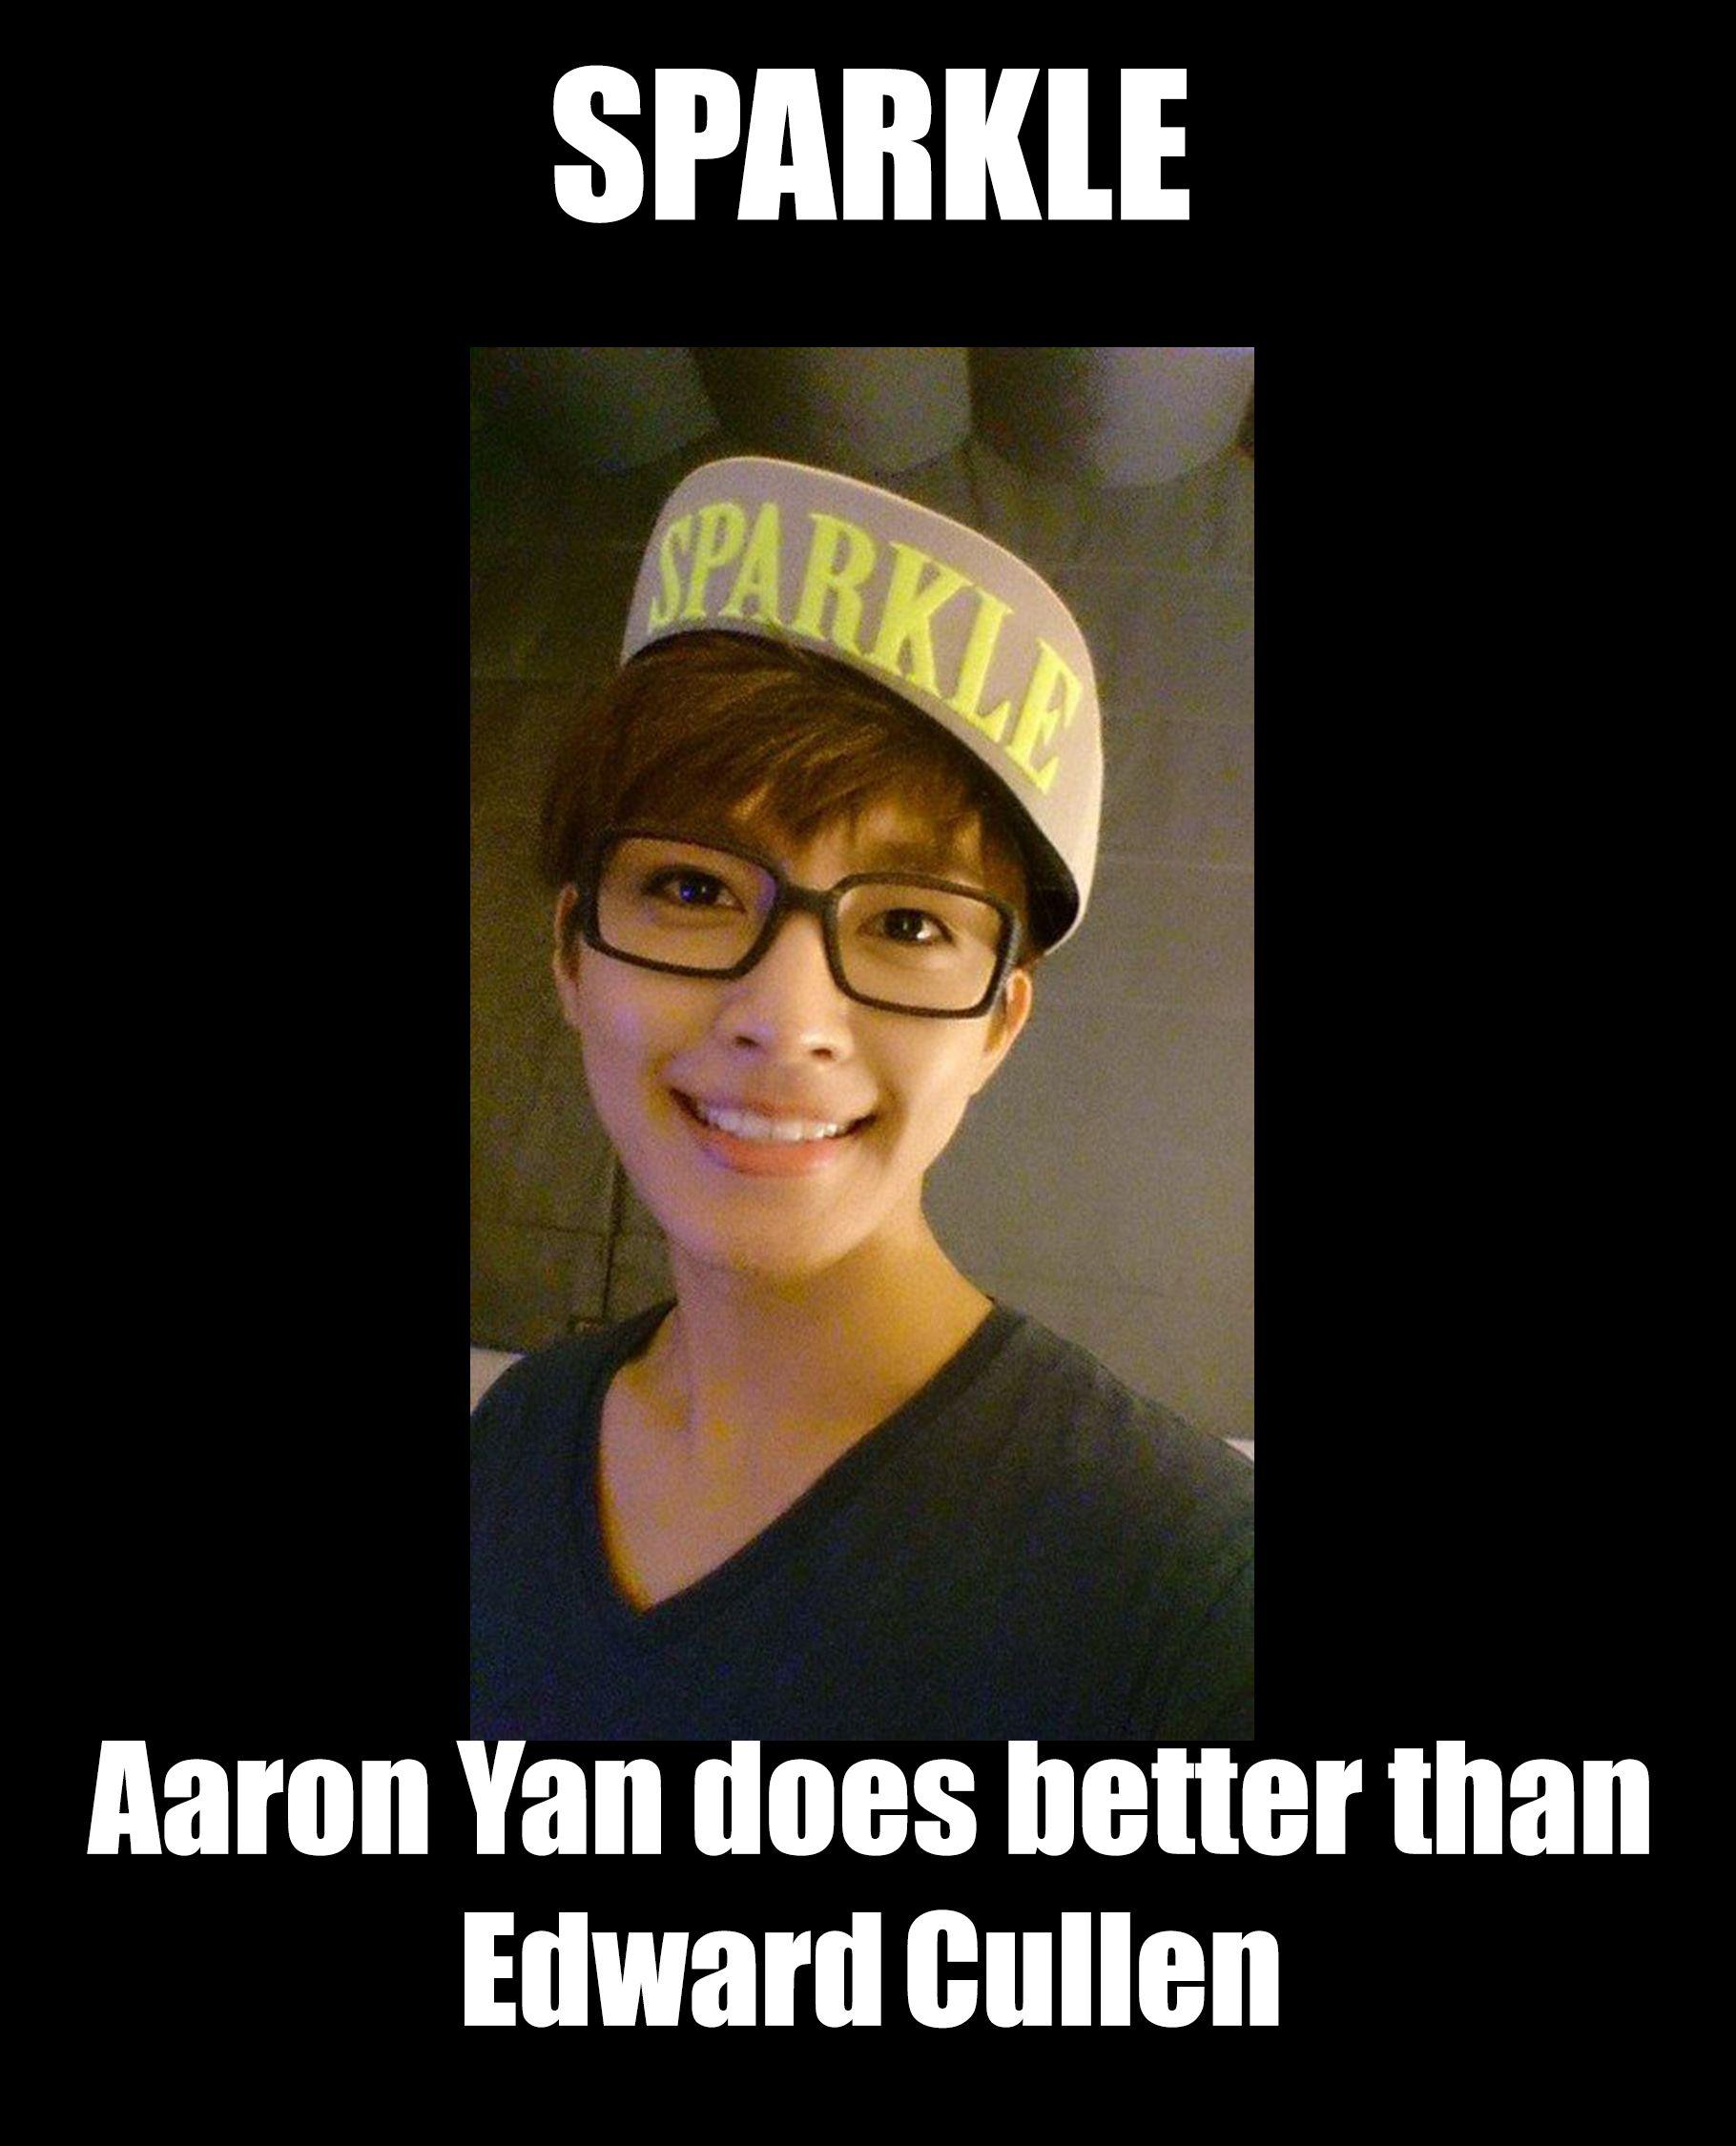 273664058bd0ac134f20d4c83a2dbfa2 sparkle' aaron yan does better than edward cullen aaron yan